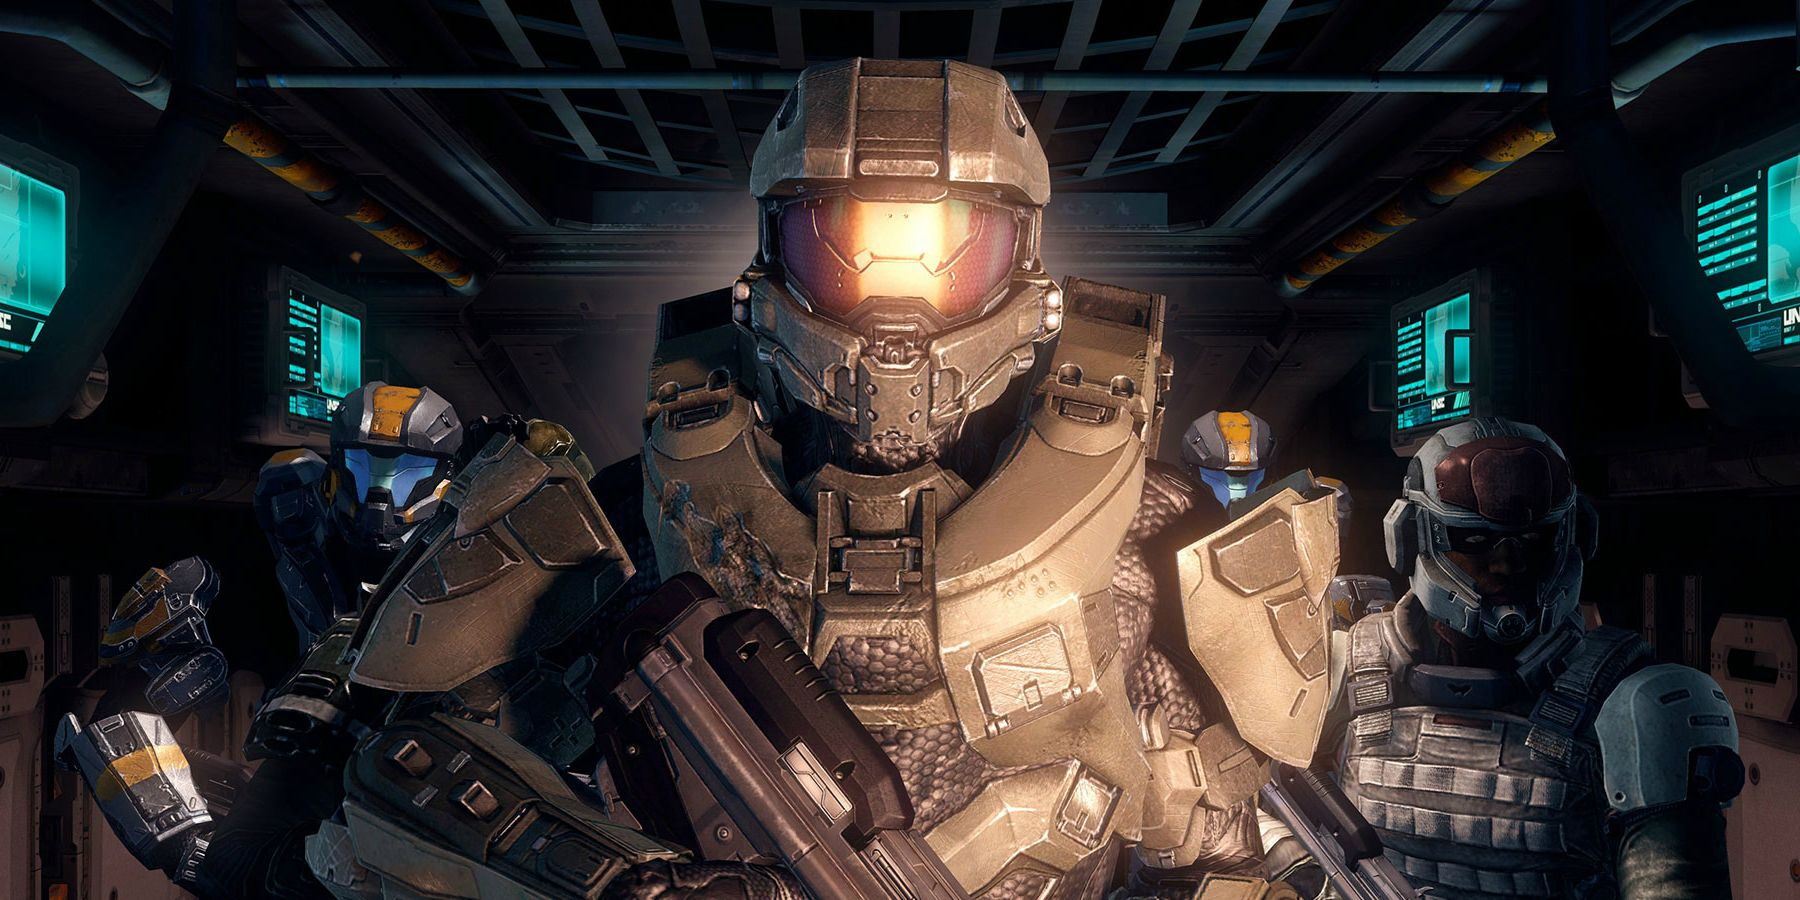 Halo Infinite Has 4-Player Splitscreen & Reach-Style